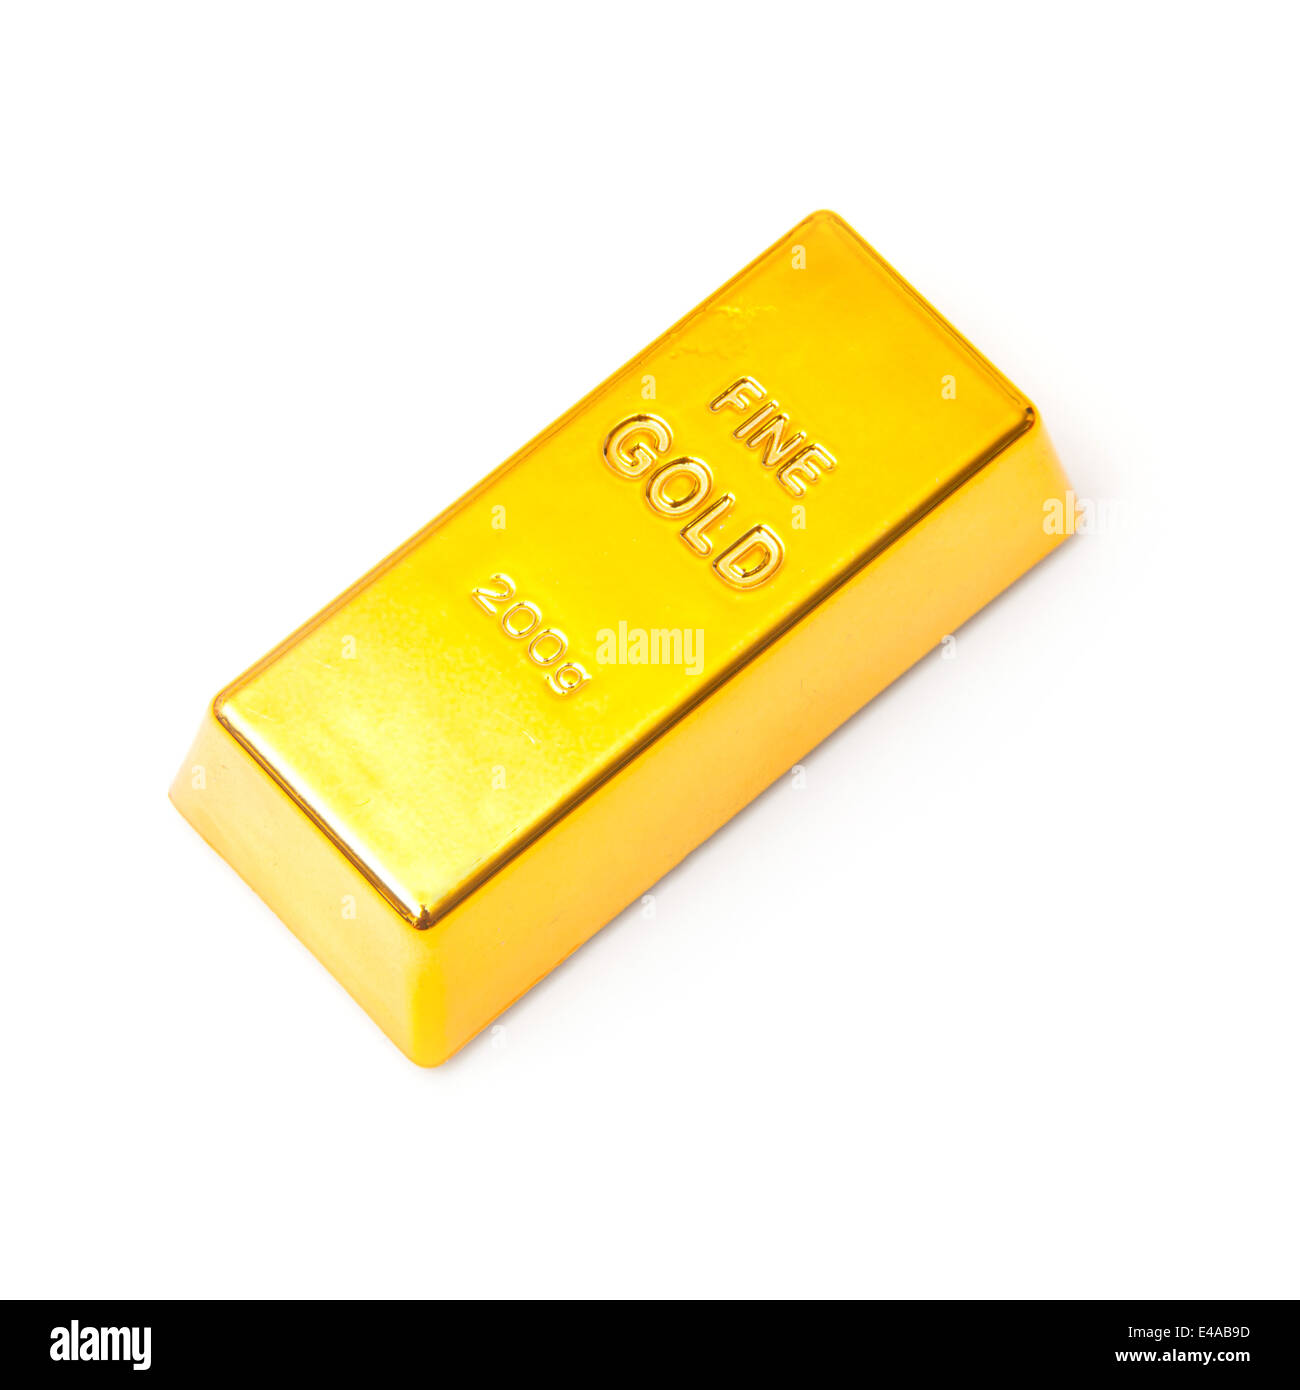 200 gram gold bar or ingot isolated on a white studio background. - Stock Image